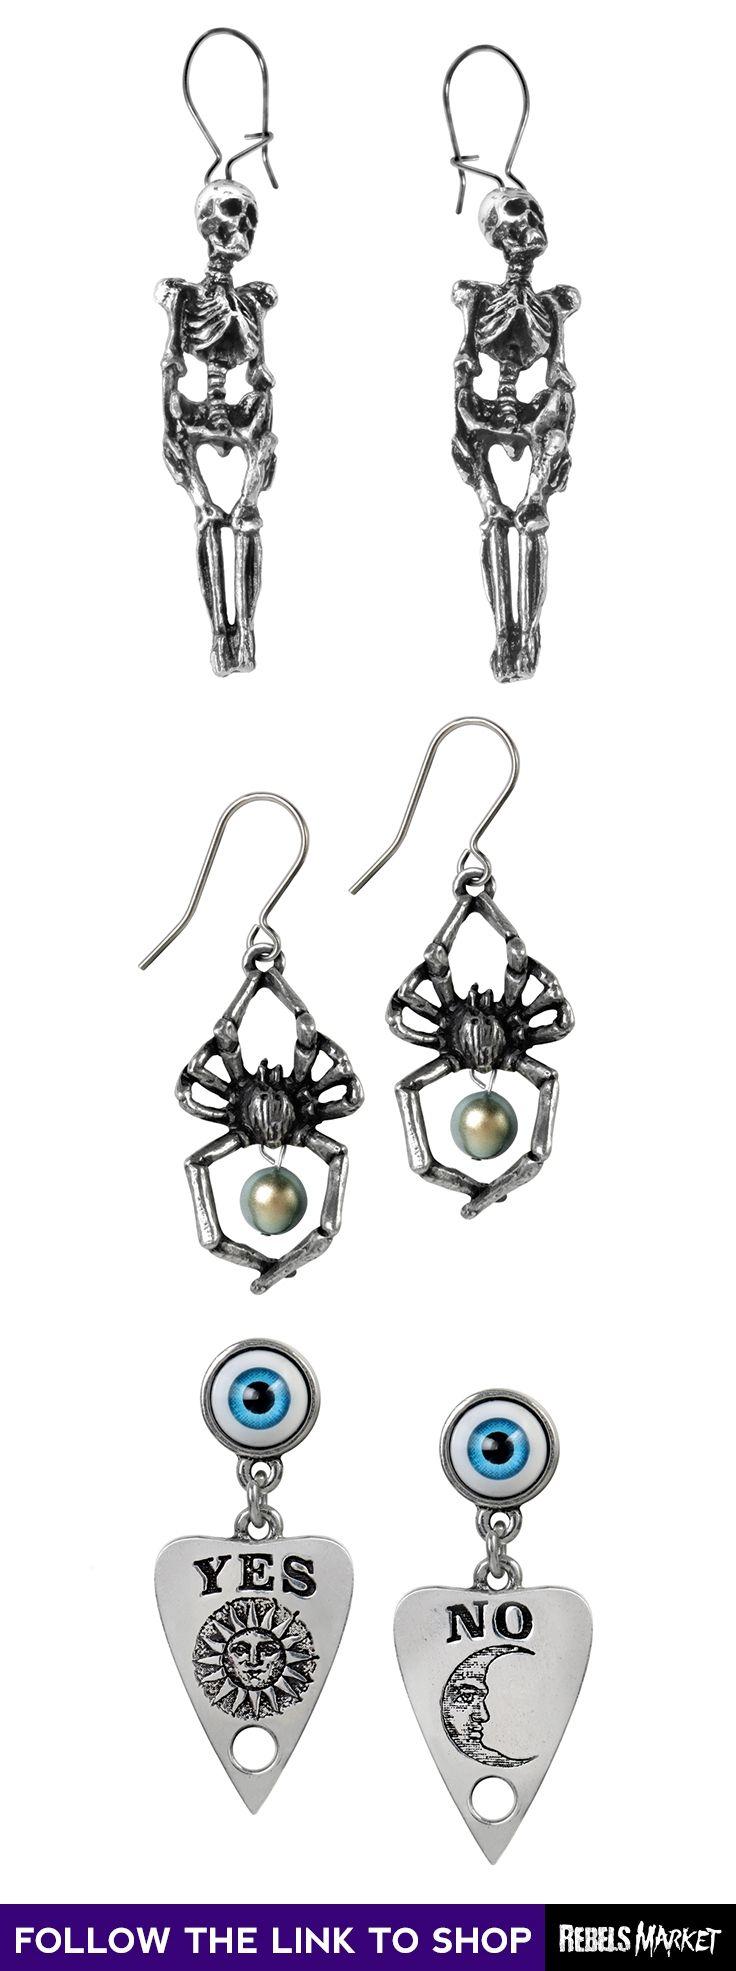 Shop gothic steampunk earrings online at RebelsMarket.